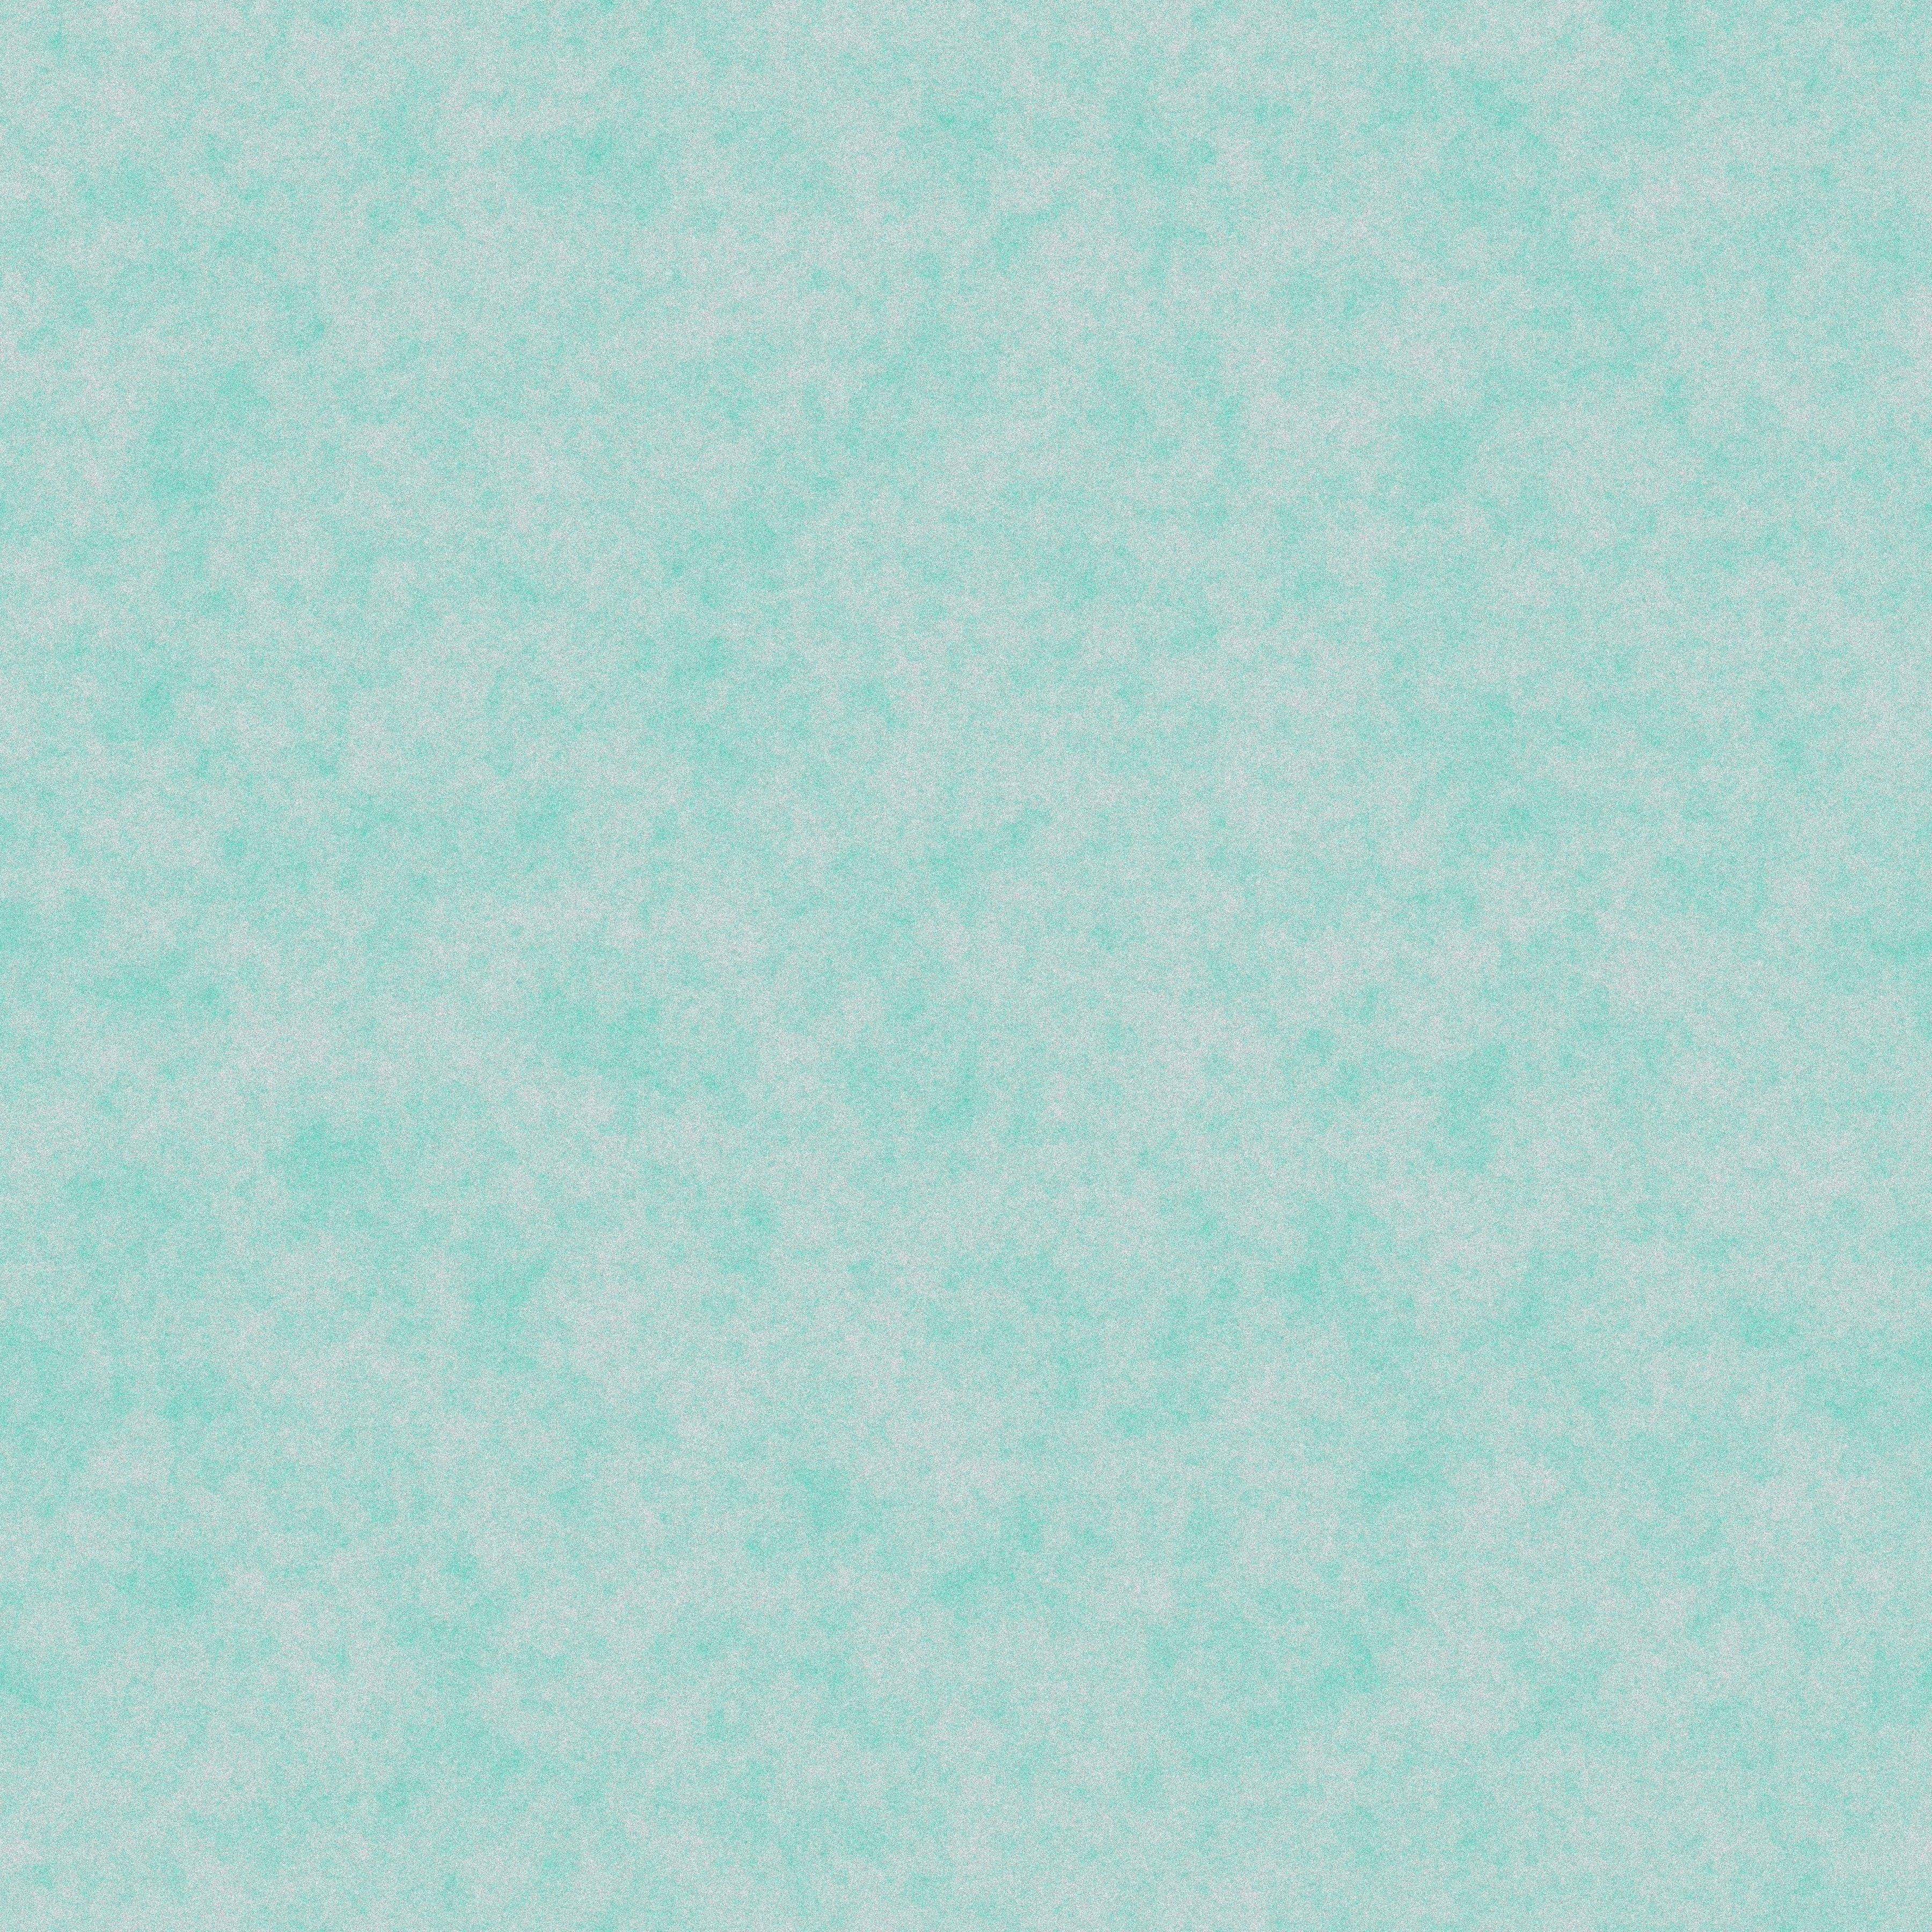 Free stock photo of decorative, digital, ice, snow